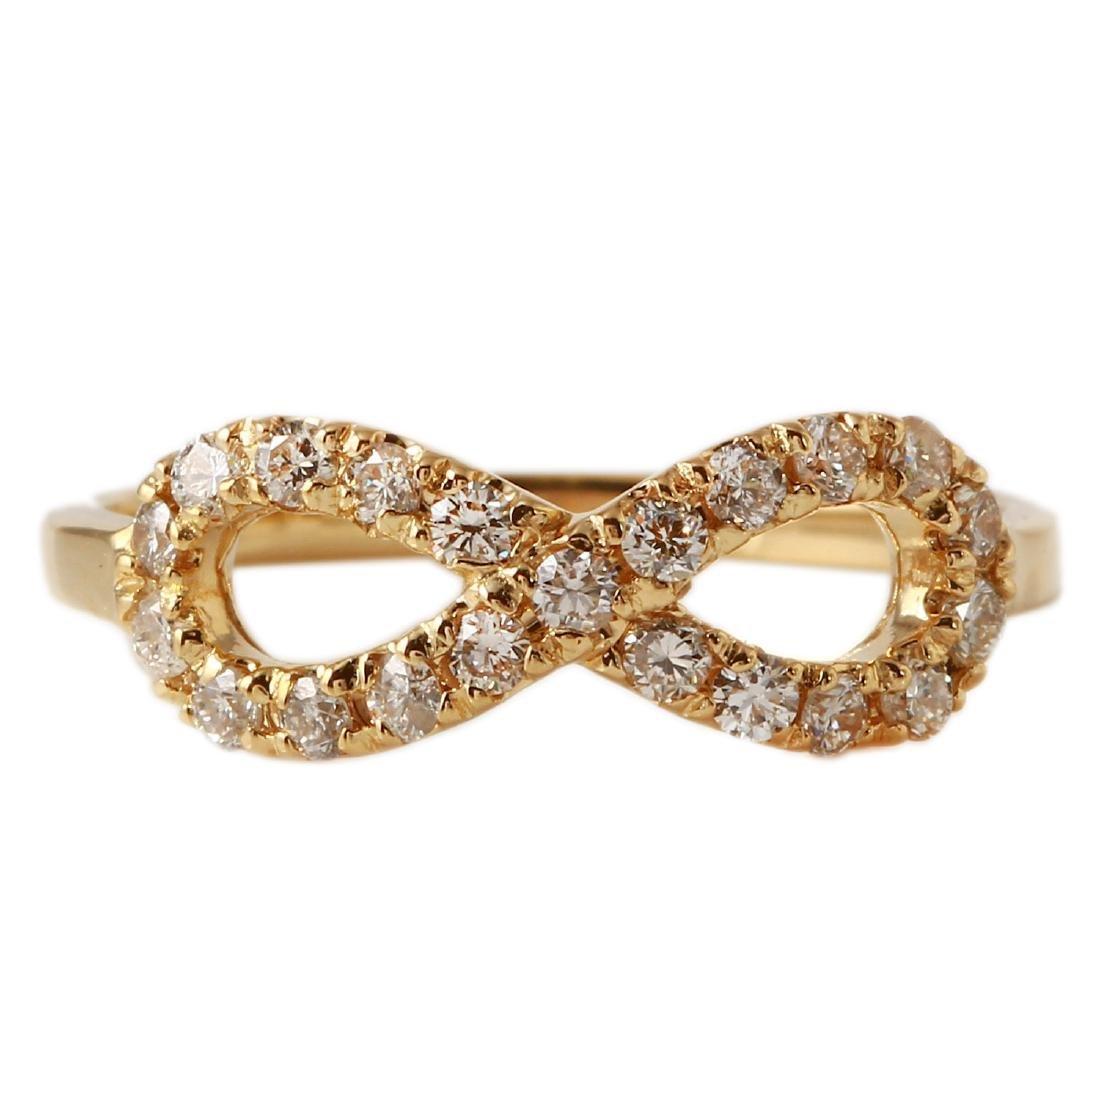 0.40 Carat Natural Diamond 18K Solid Yellow Gold Ring